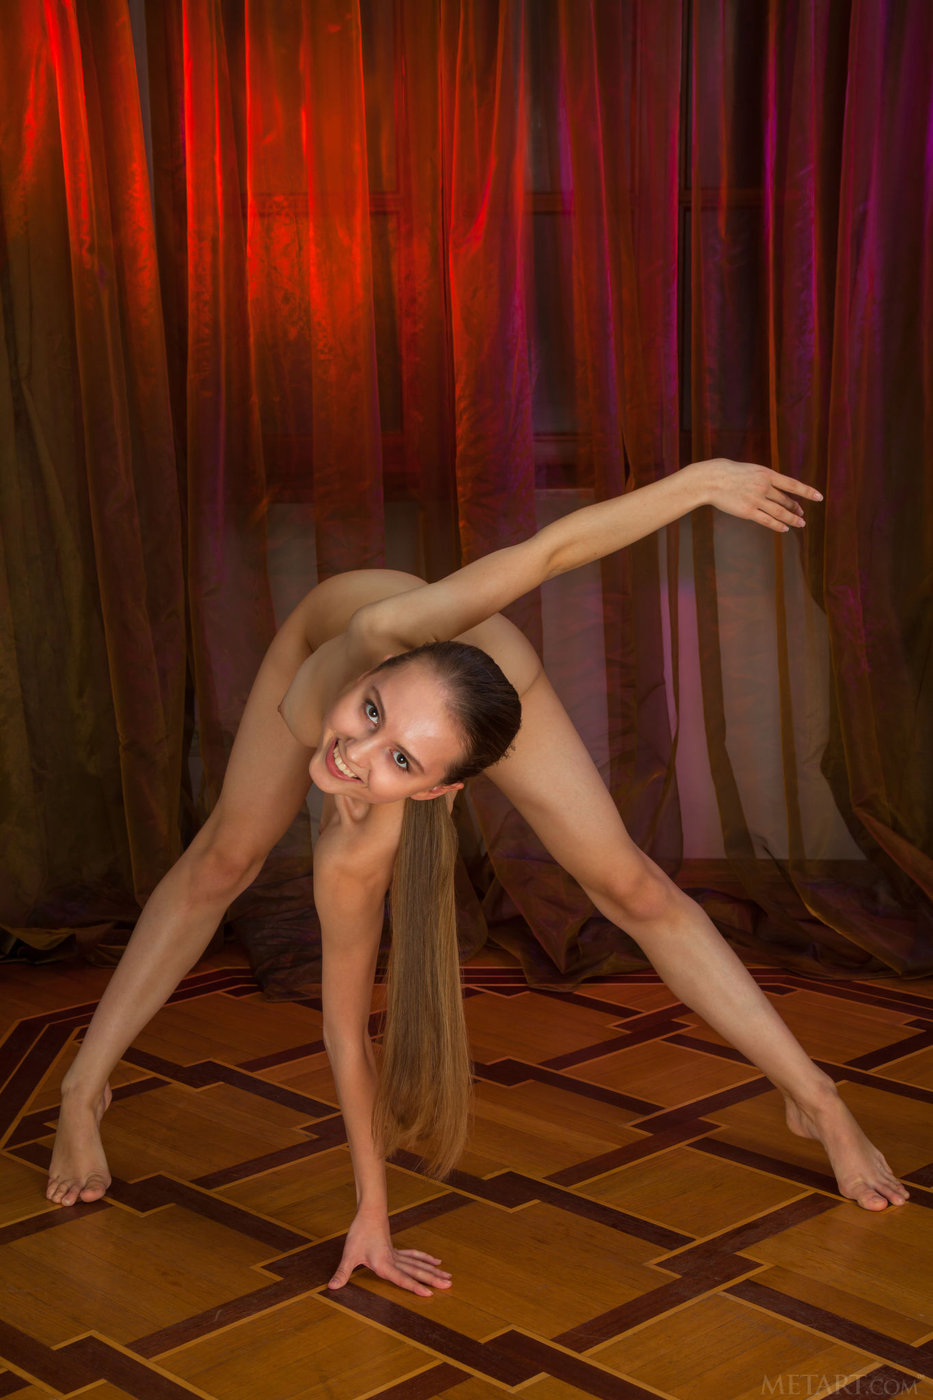 Found leggy redhead contortionist the